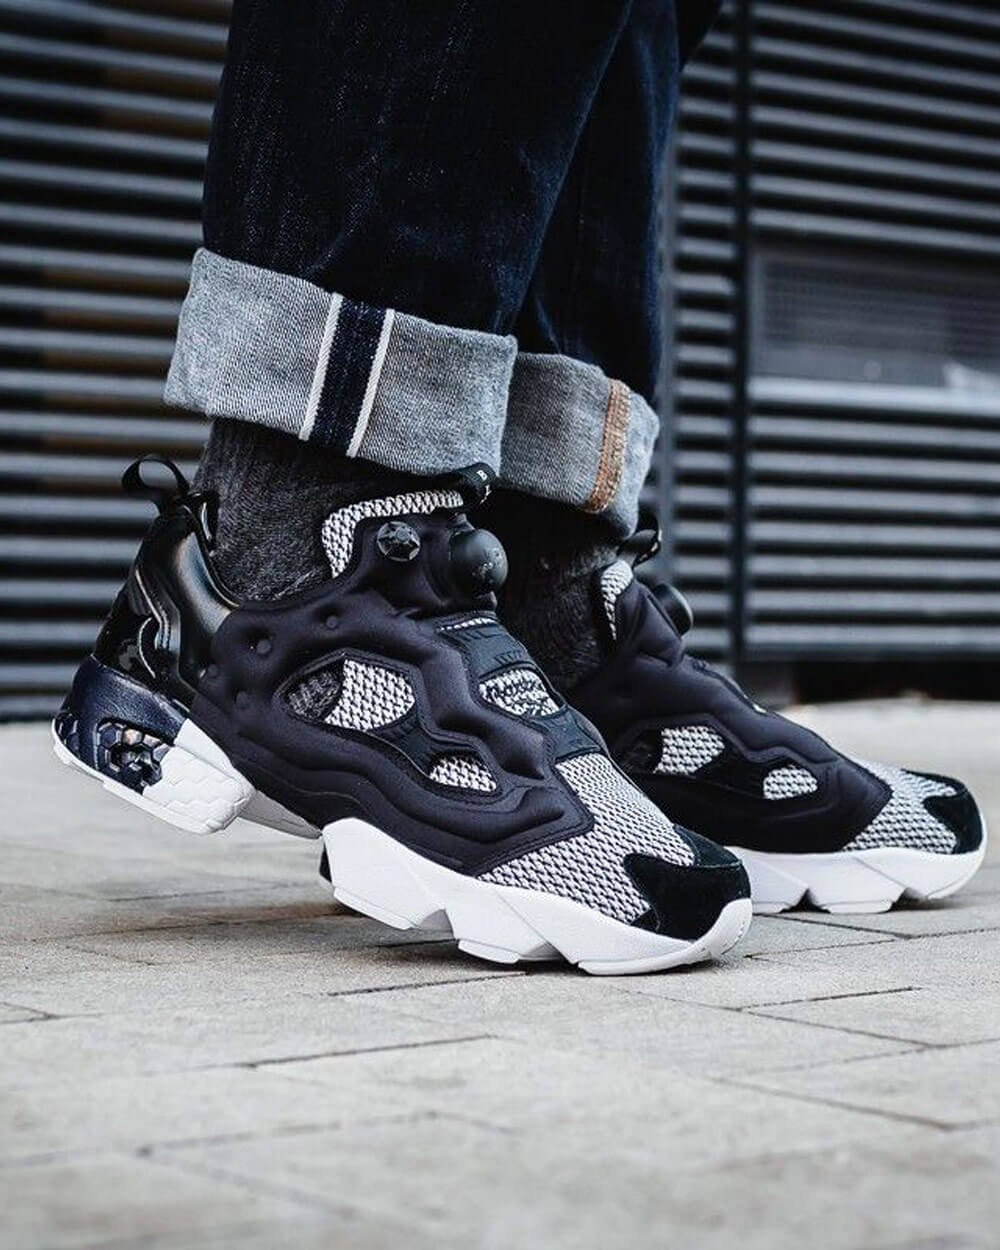 Reebok Instapump Fury tech sneakers